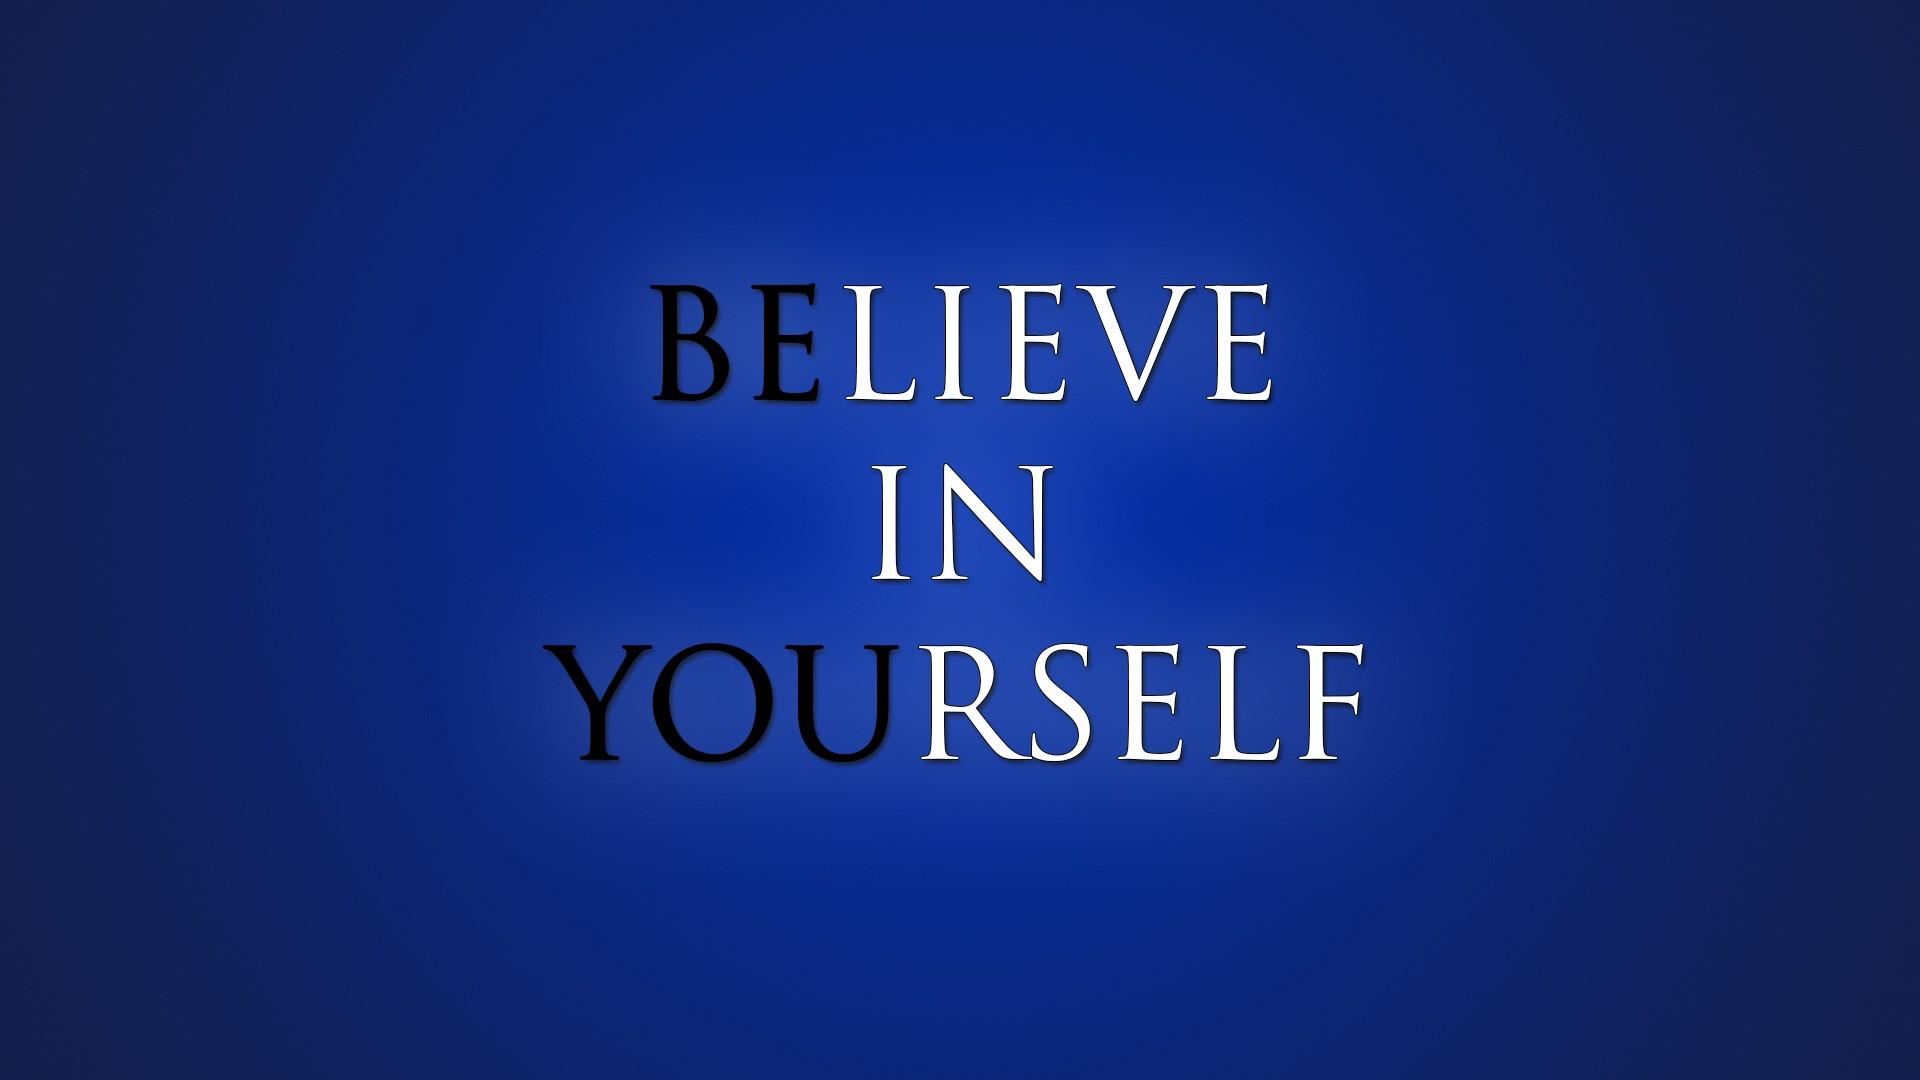 believe-in-yourself-218323  Believe